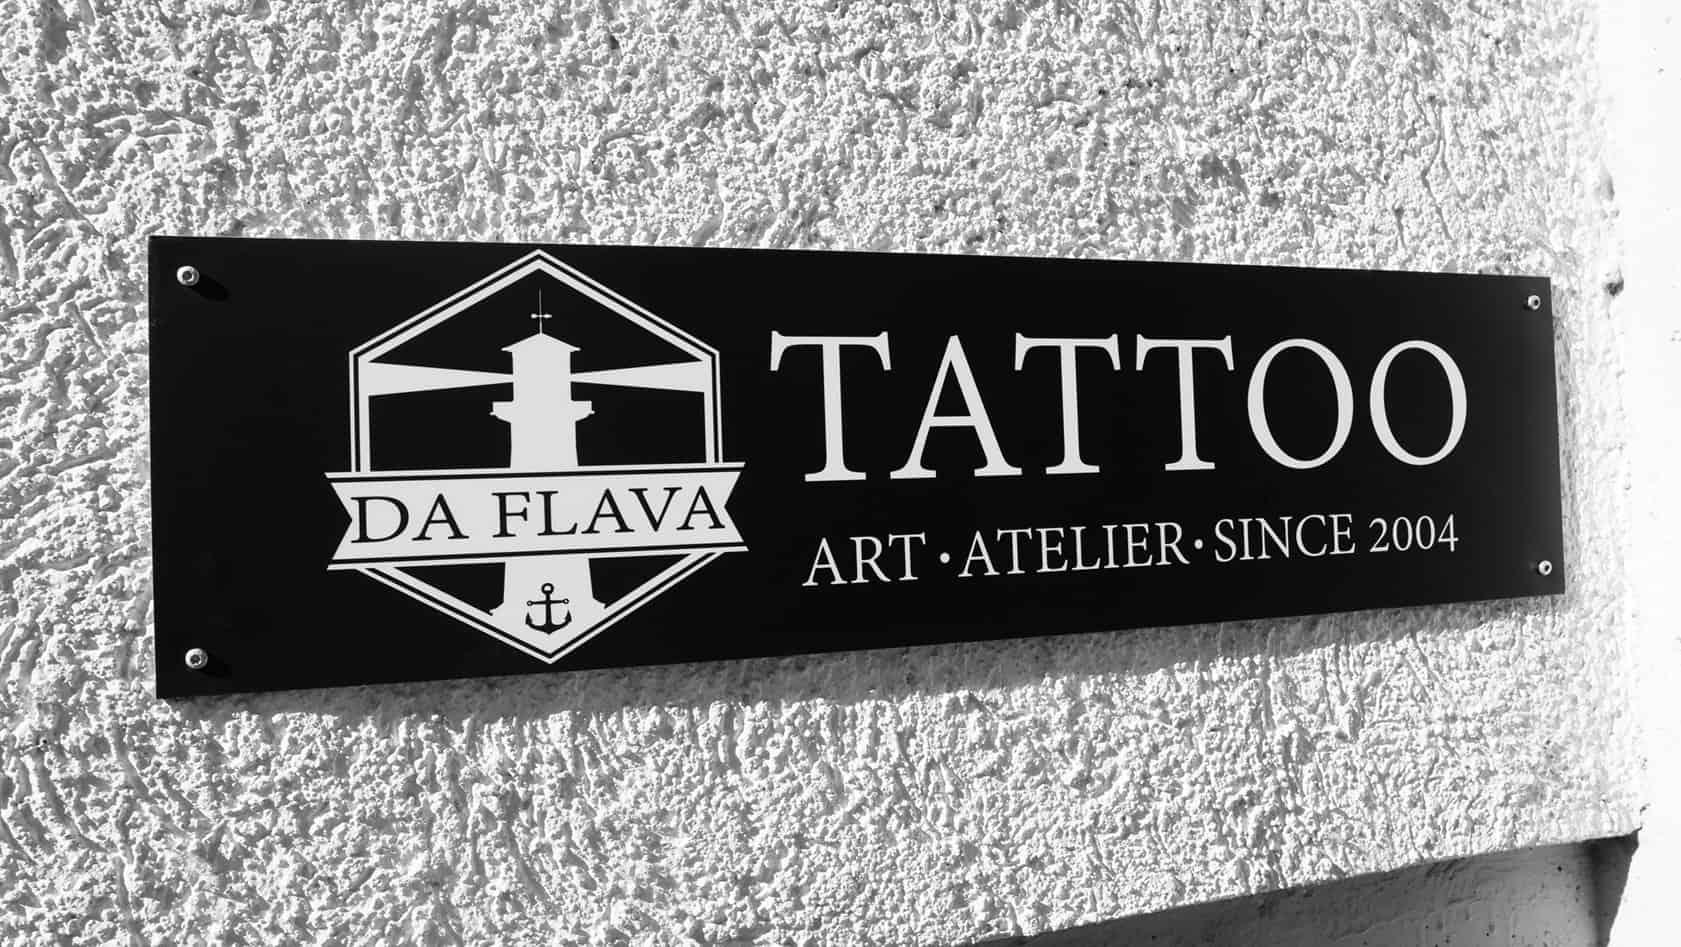 da flava tattoos front